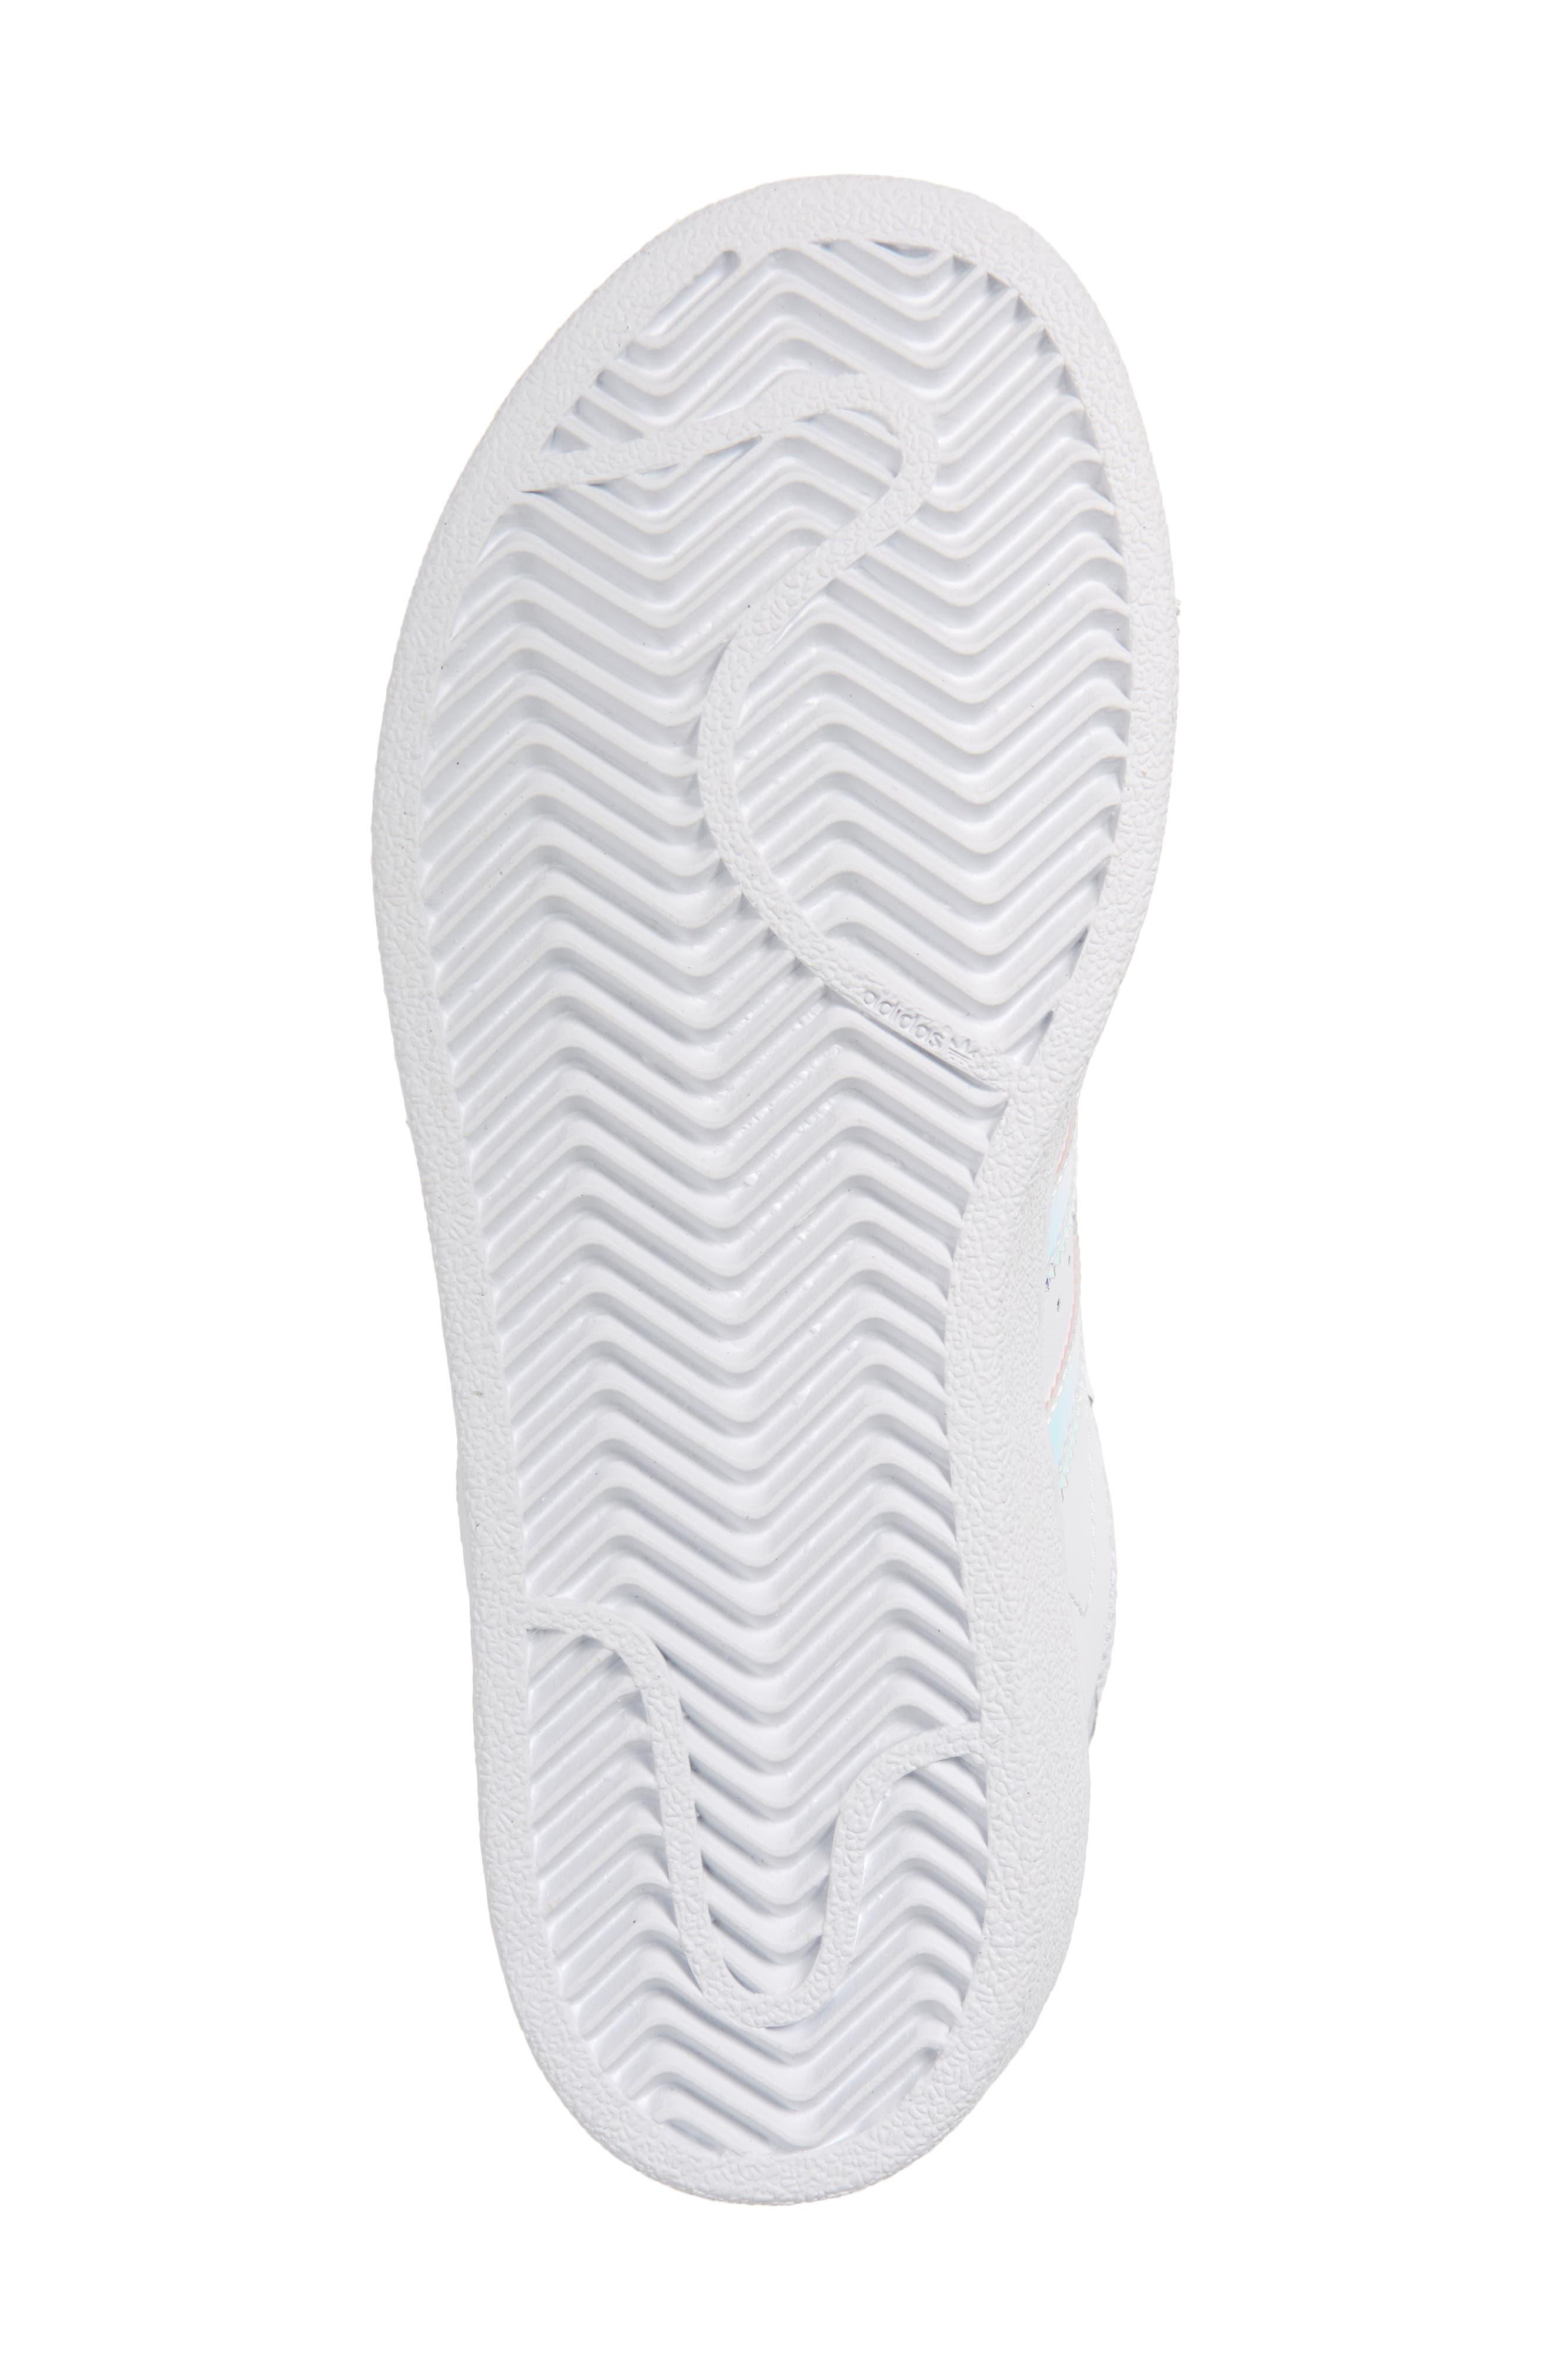 Superstar - Iridescent Sneaker,                             Alternate thumbnail 6, color,                             100